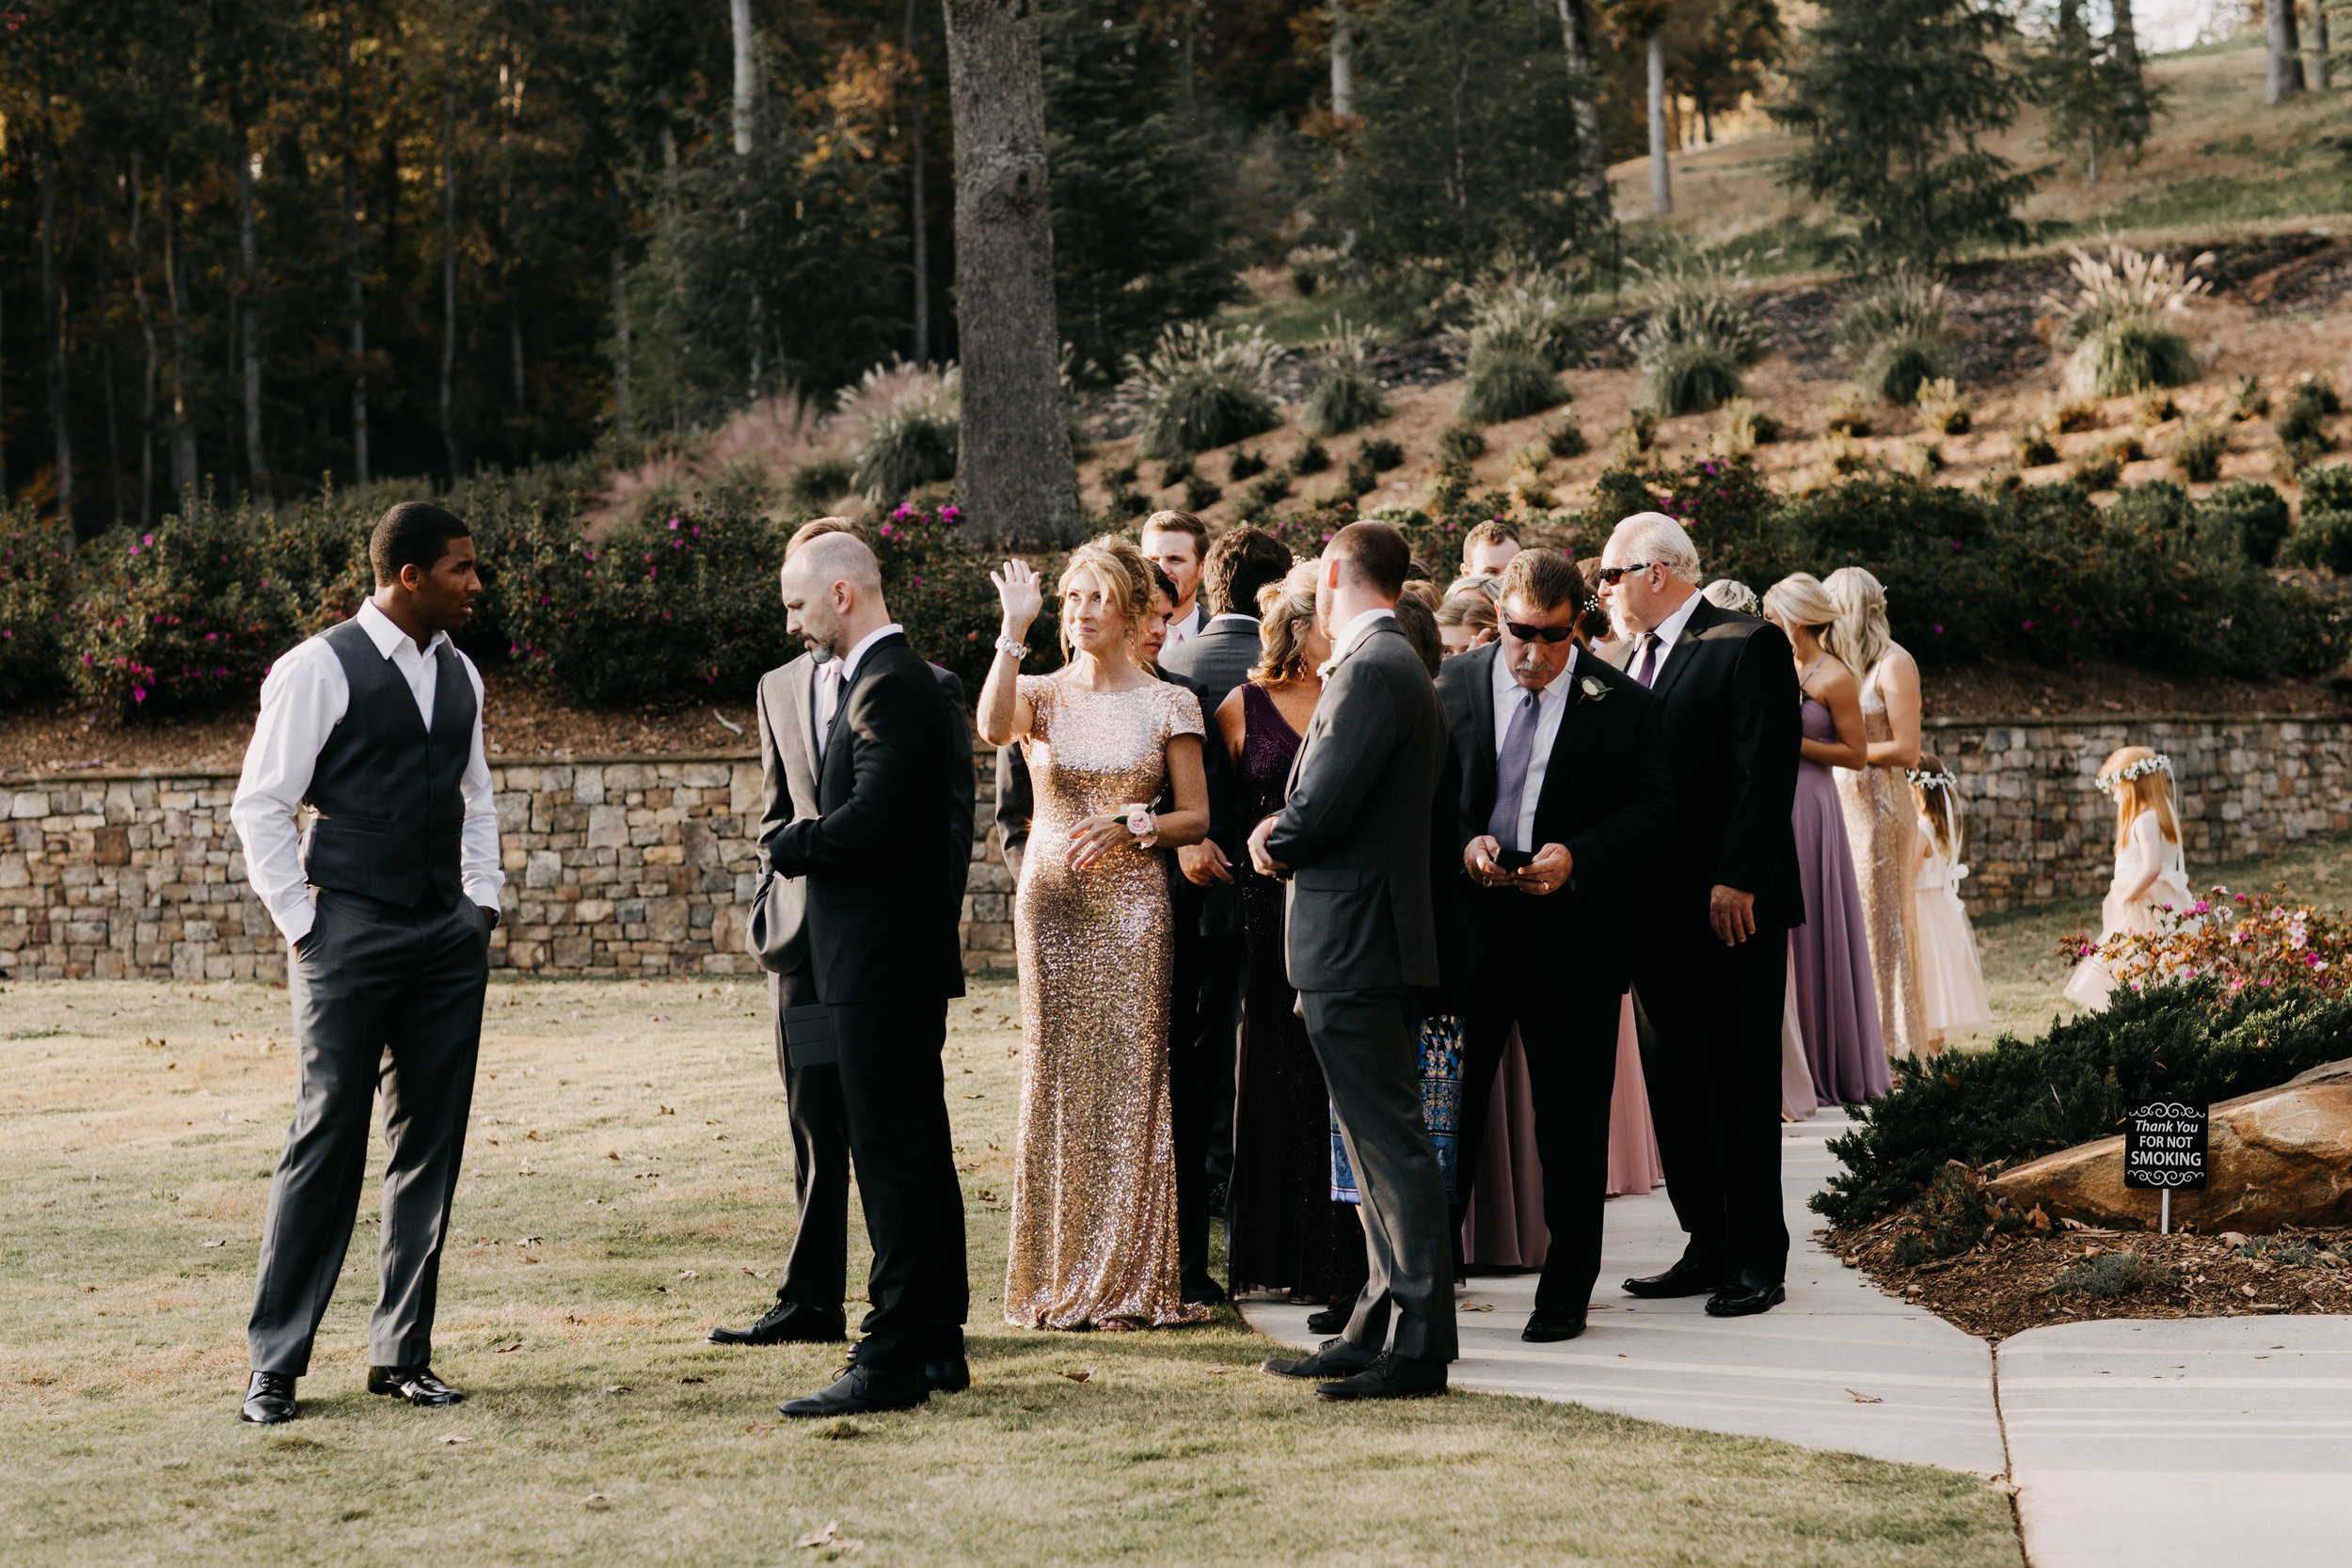 Kaylyn & Ryan Final Wedding Photos239.jpg